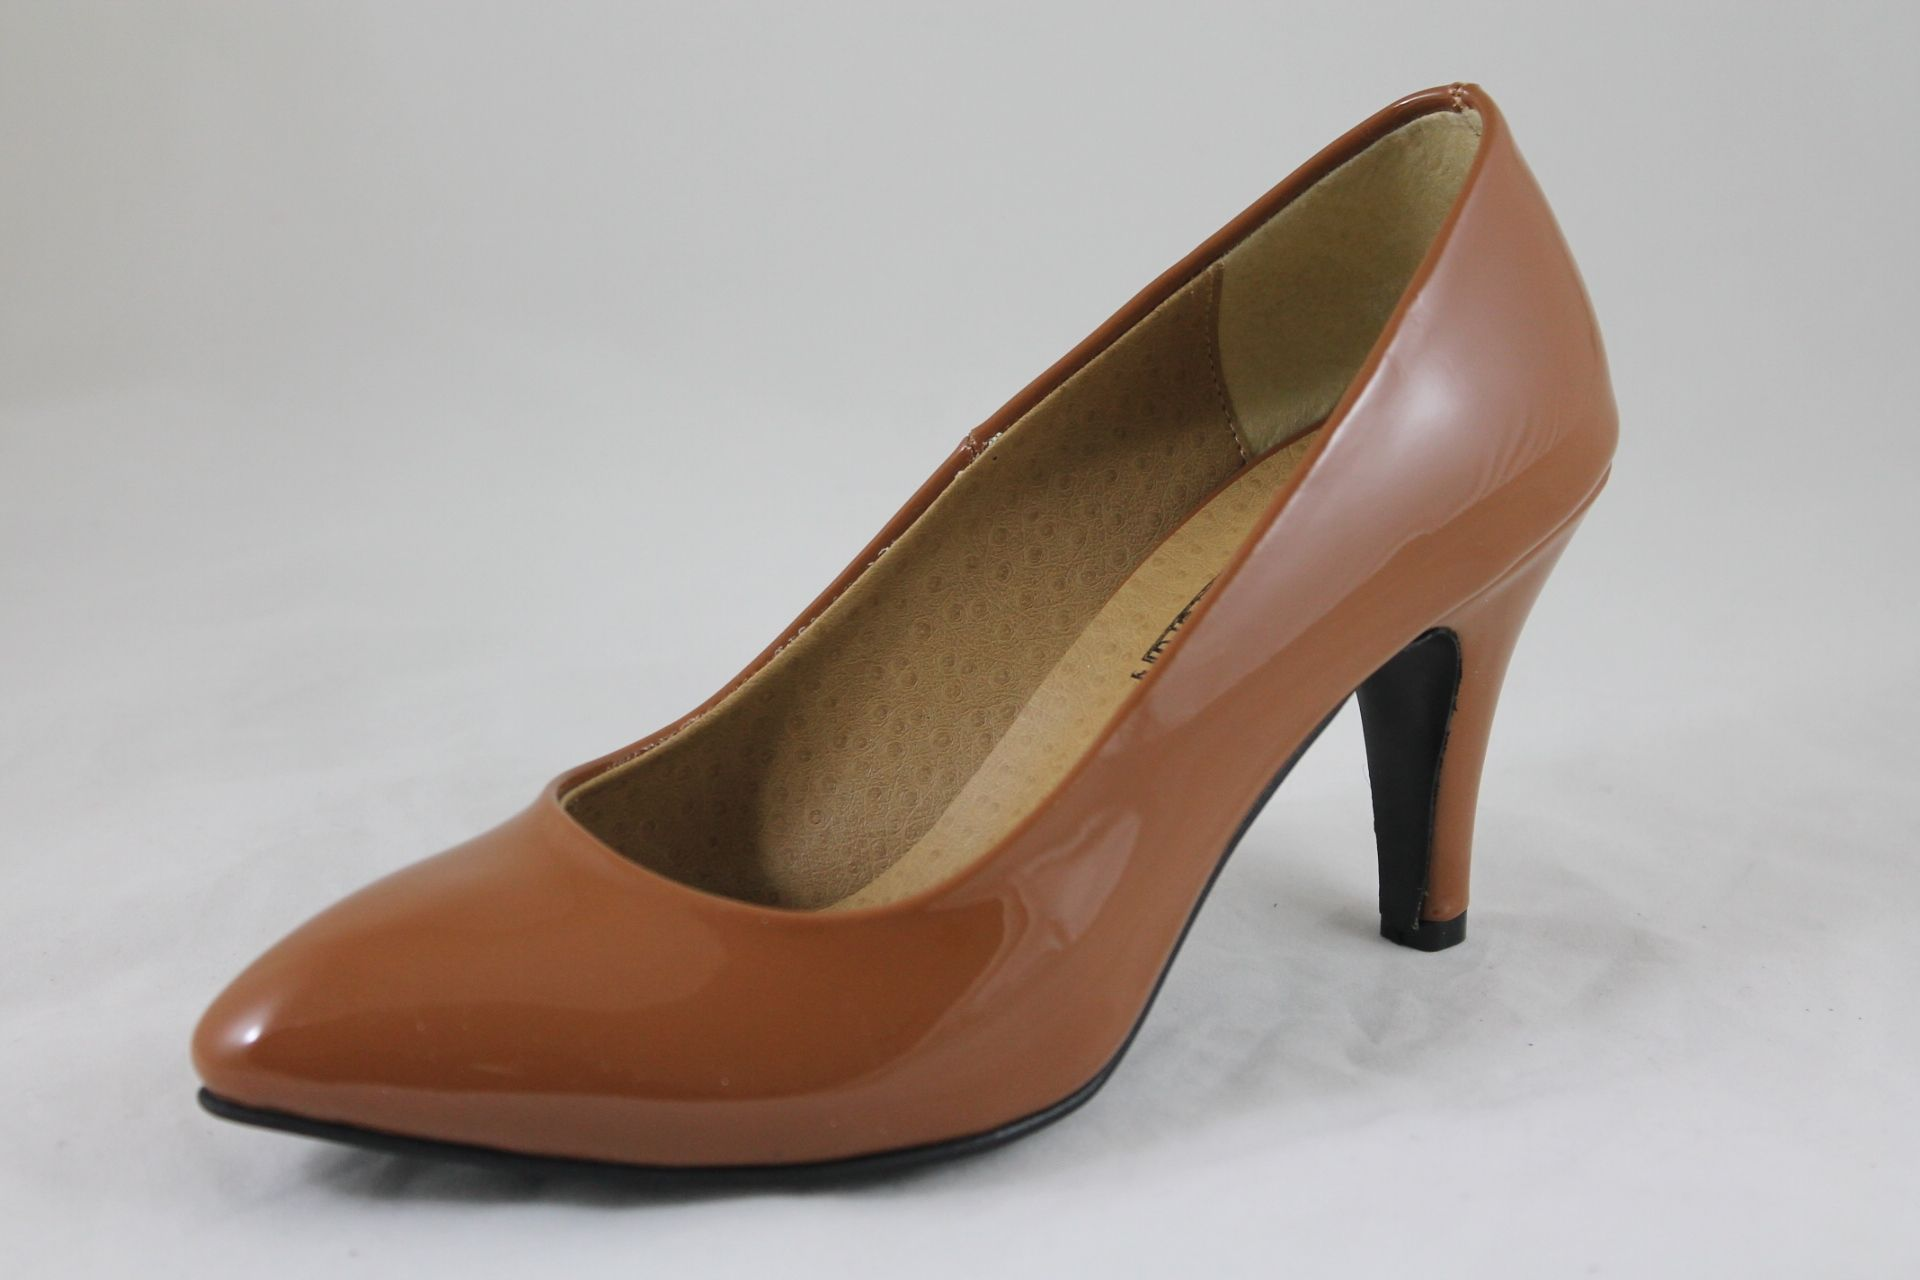 33c3f73d6173a سعر Shoebox حذاء كلاسيك بكعب عالي جلد فيرنية - هافان فى مصر